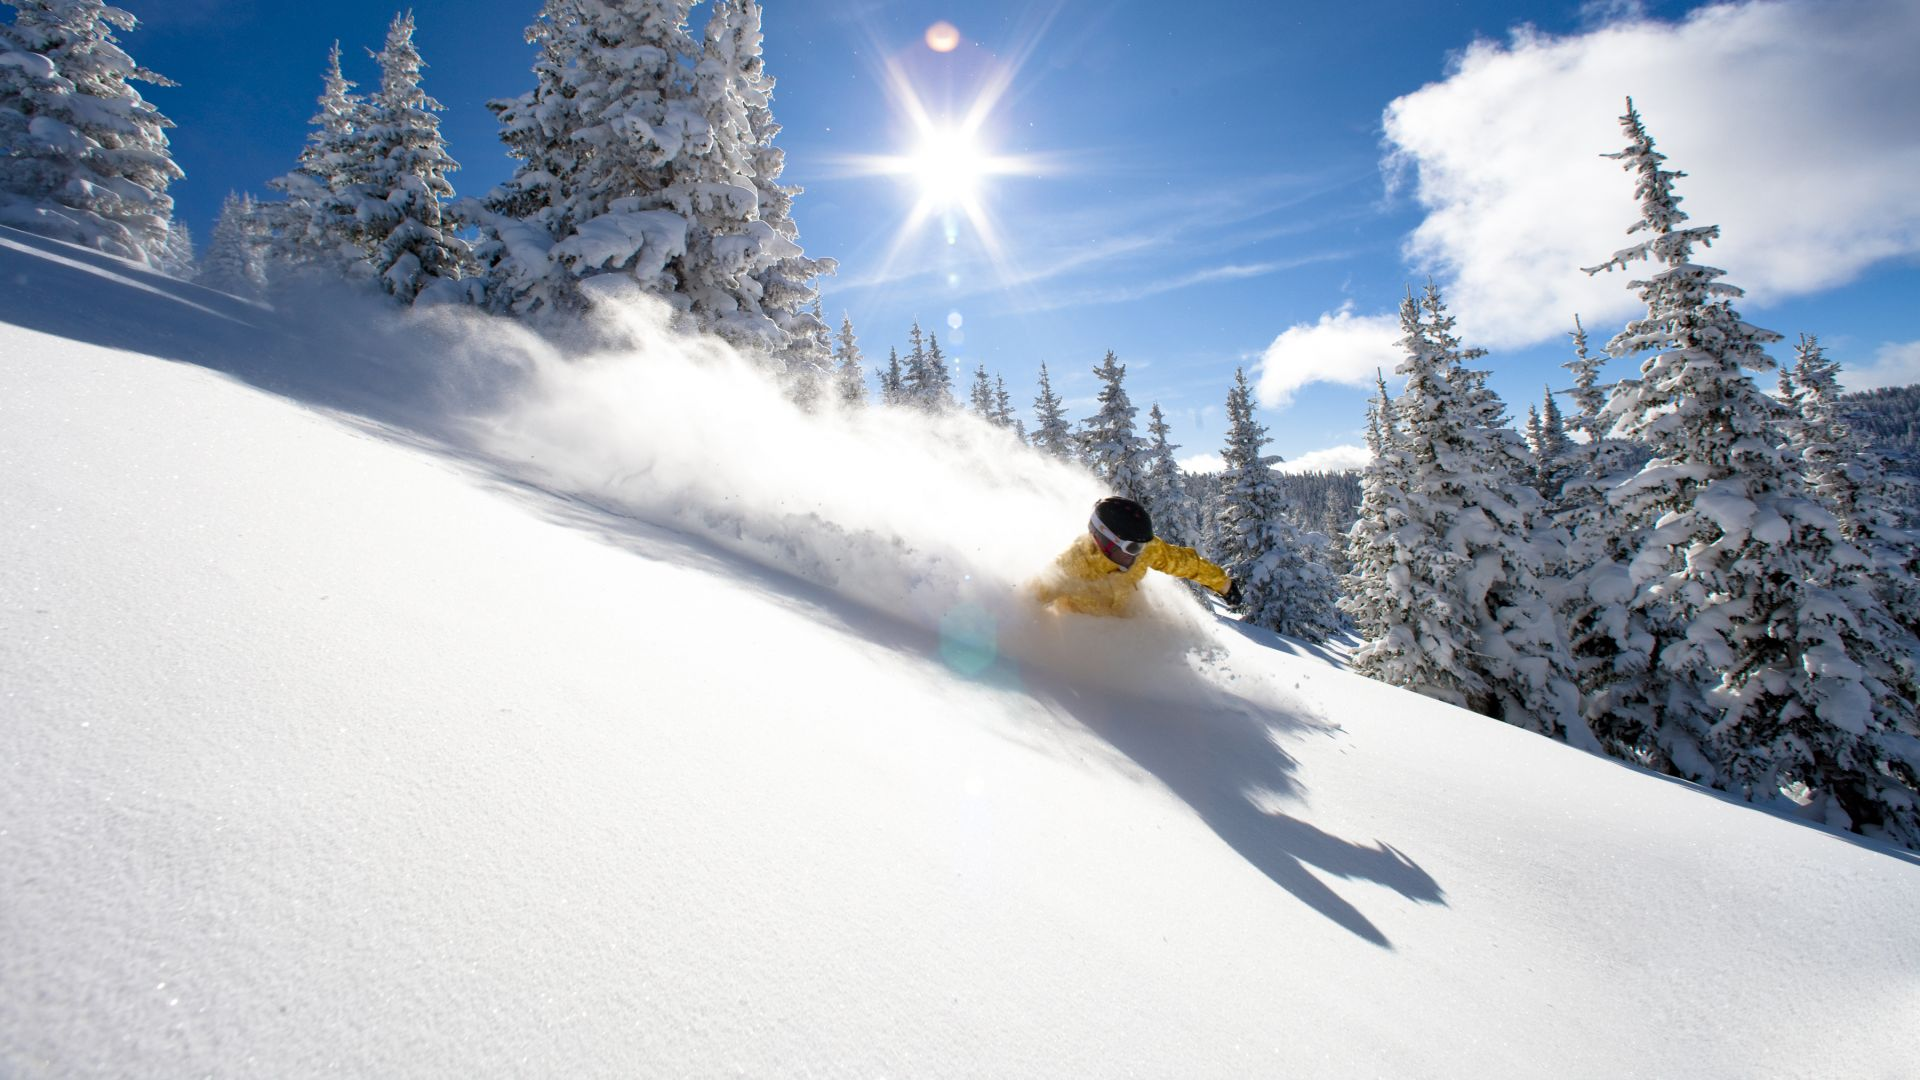 Gruppenreisen Reisen Ski Snowboard Skikurse Kinderbetreuung Winter